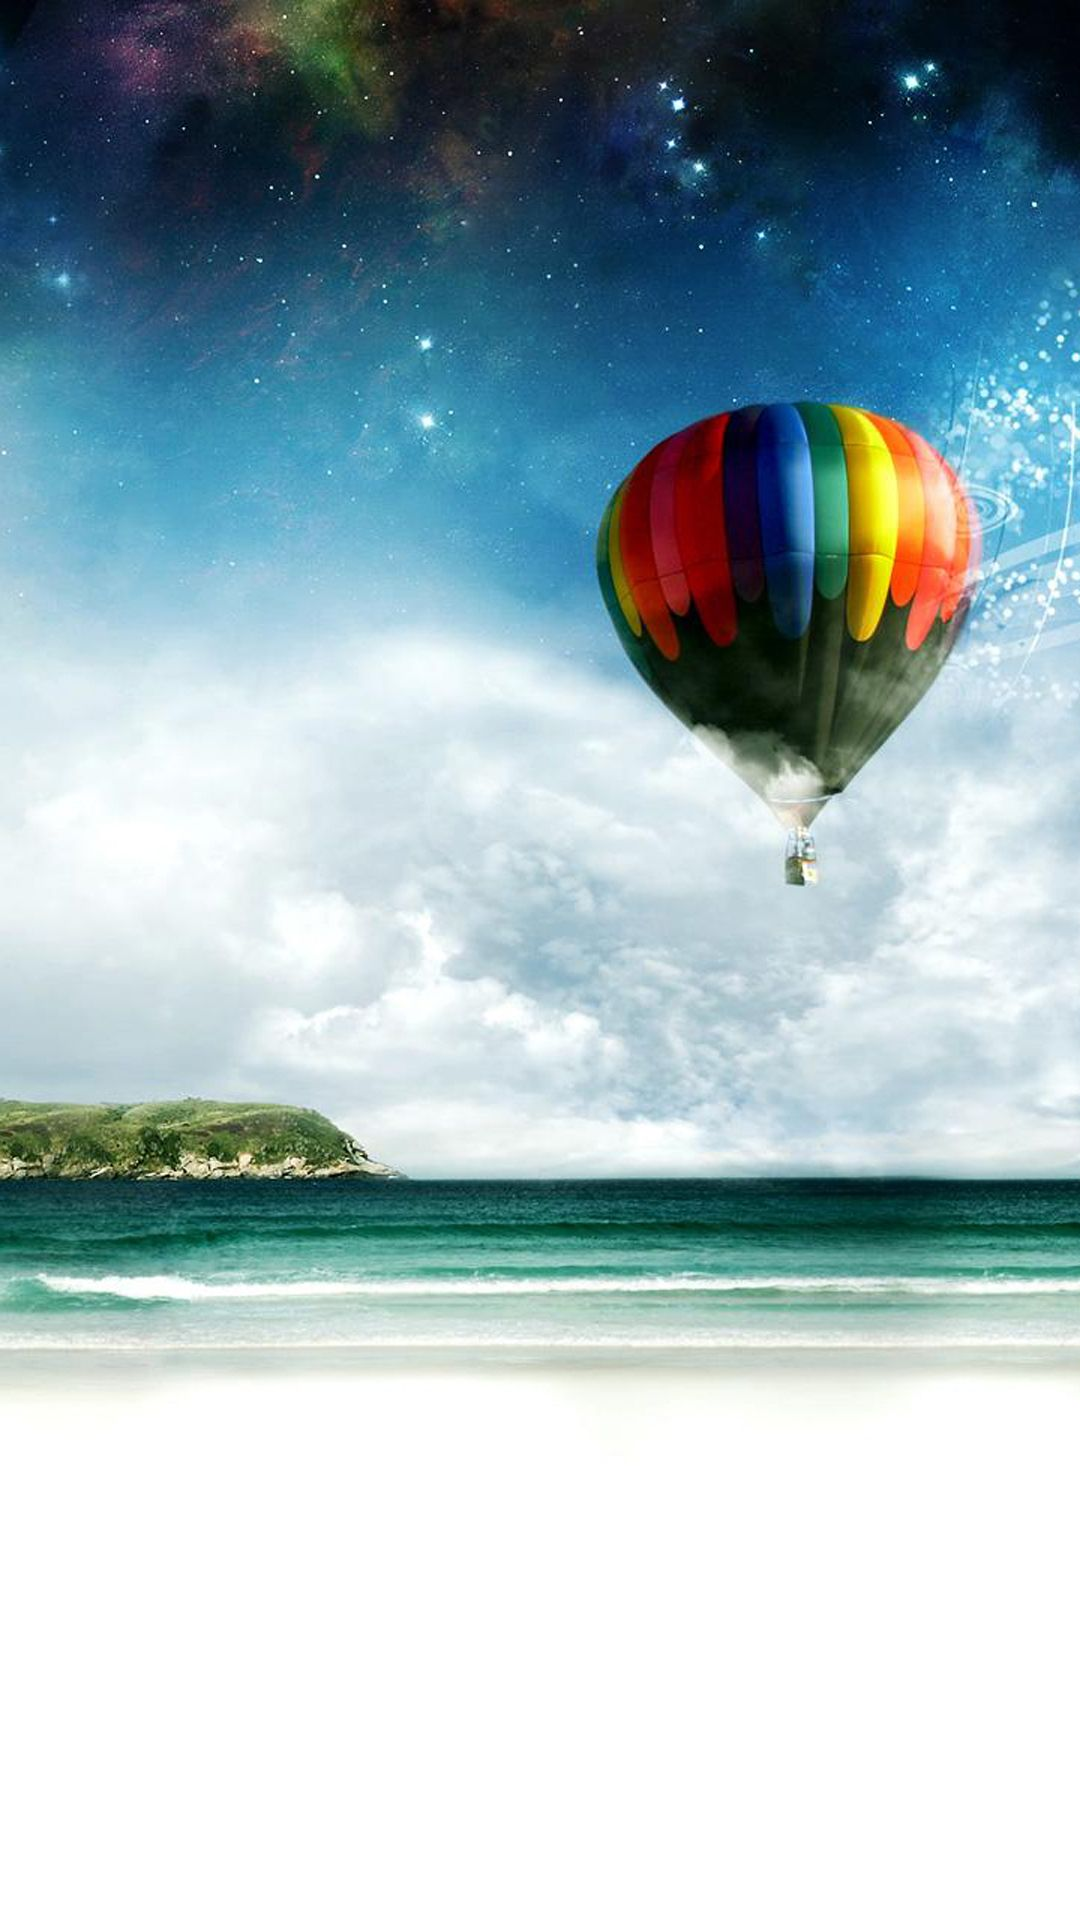 Wallpaper download pinterest - Download Samsung Galaxy S Wallpaper Size Gallery